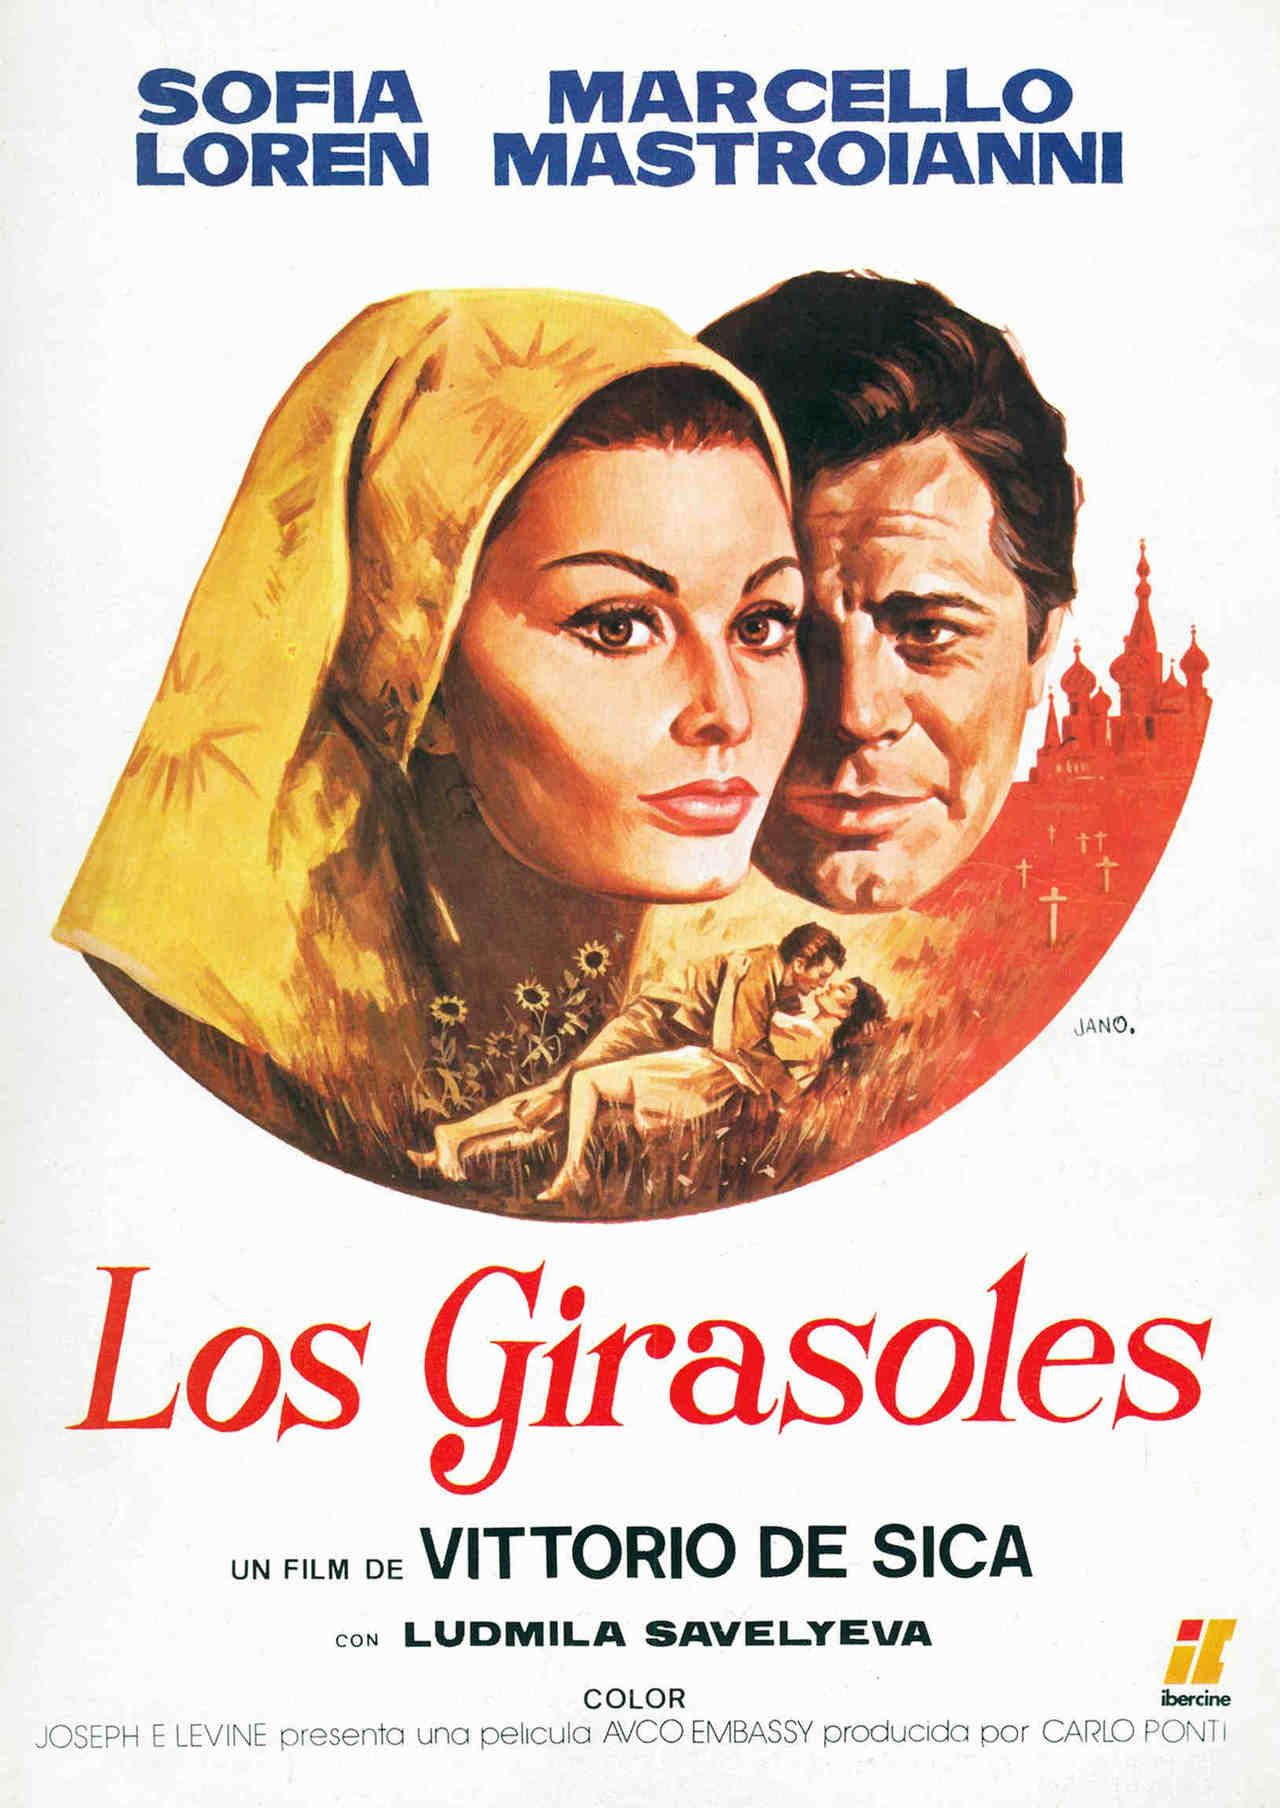 I Girasoli Sunflower 1970 Films Movies Posters 70s Italian Sophia Loren Foreign Film Film Posters